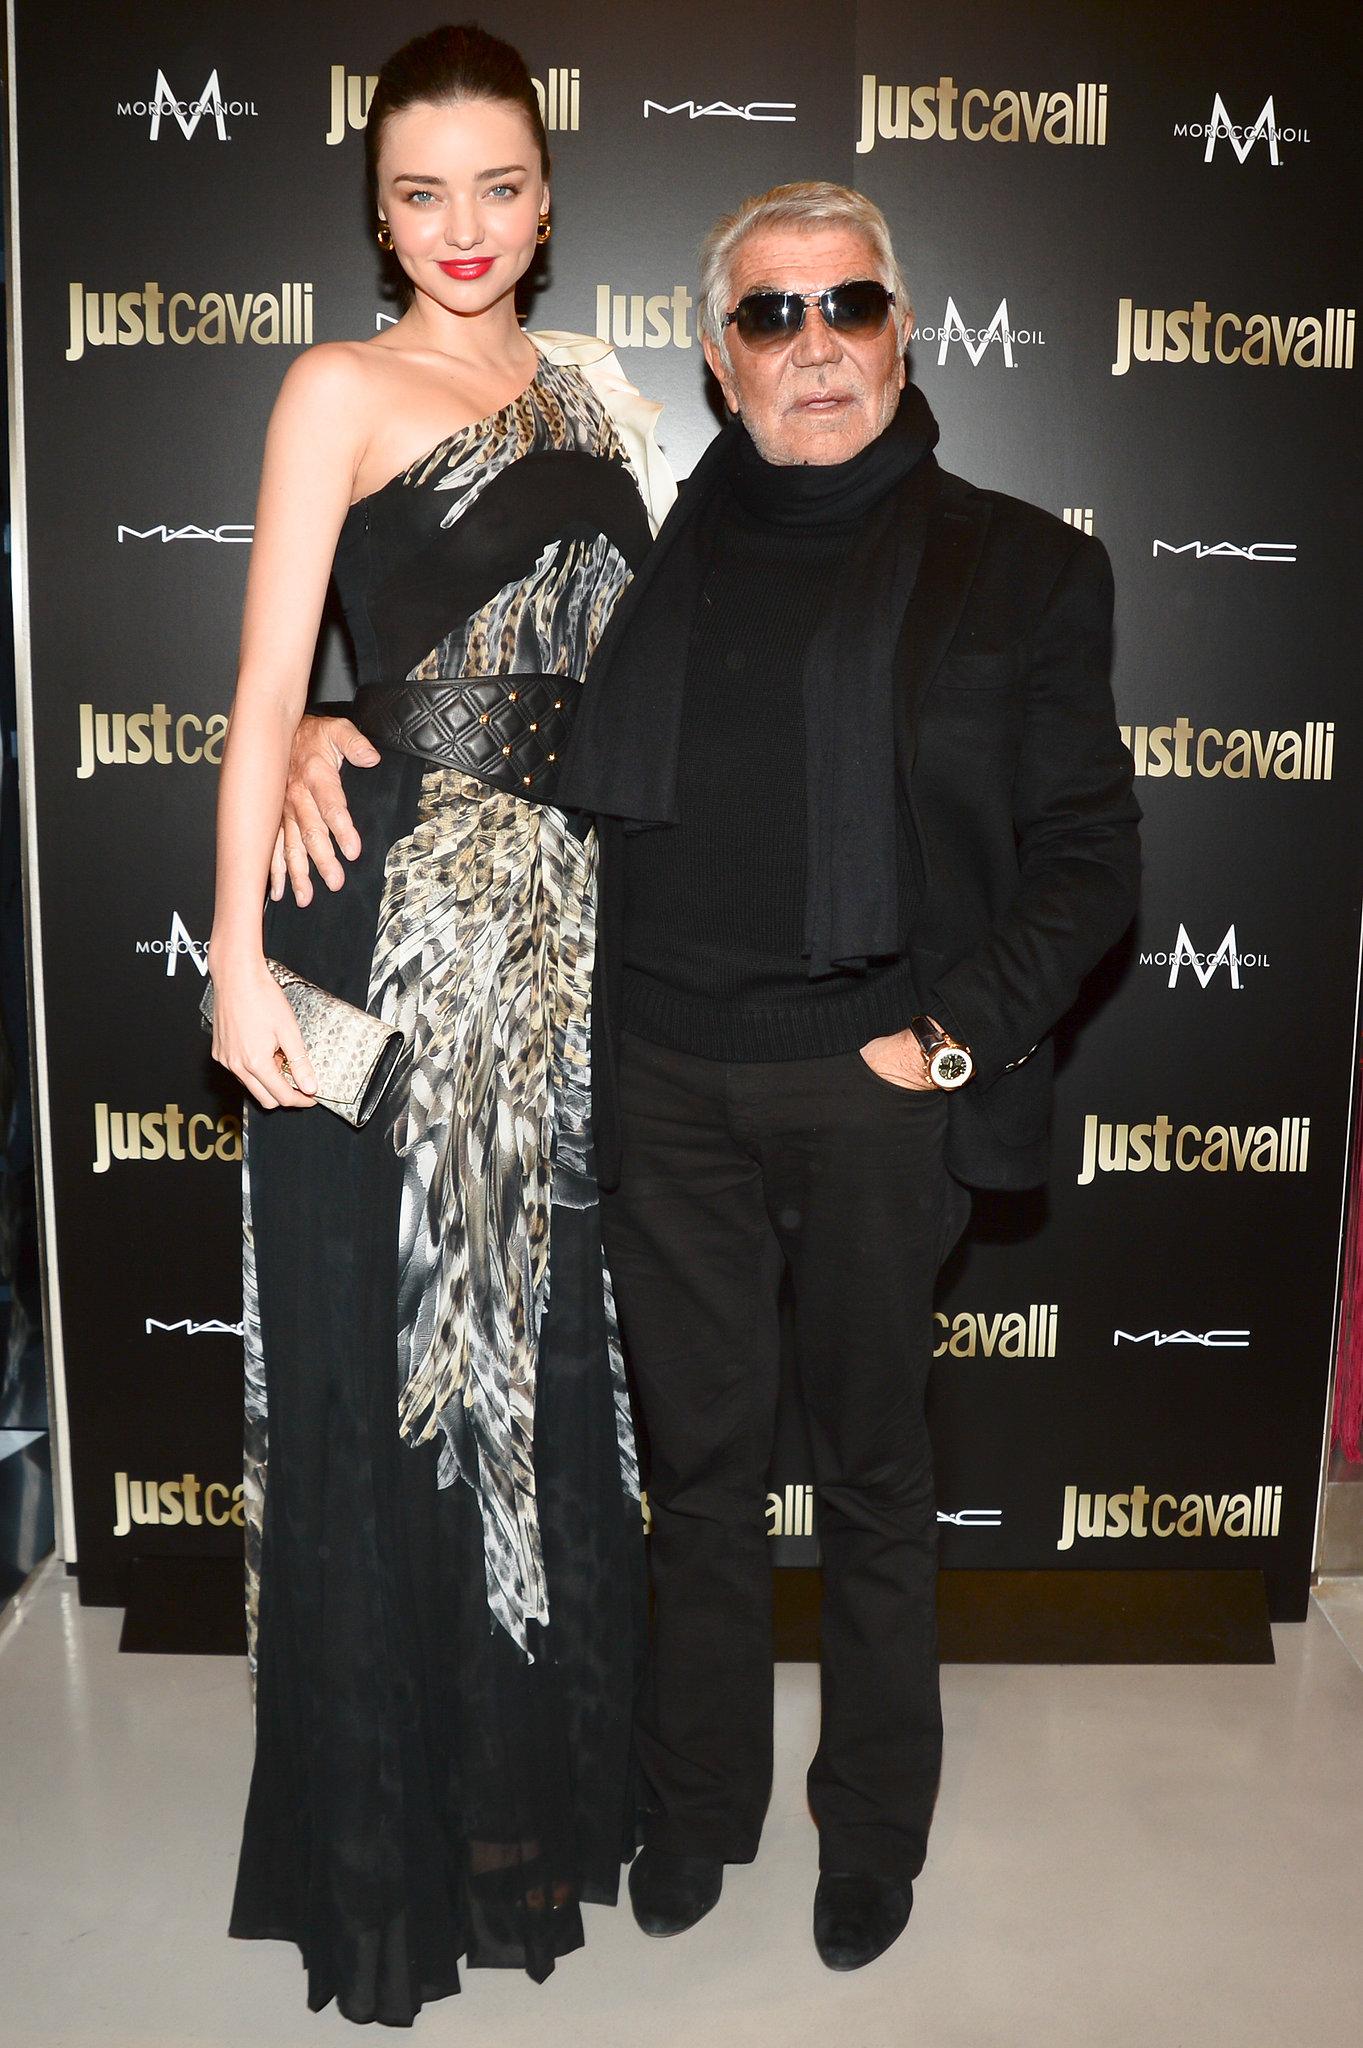 Miranda Kerr and Roberto Cavalli at the Just Cavalli cocktail party.